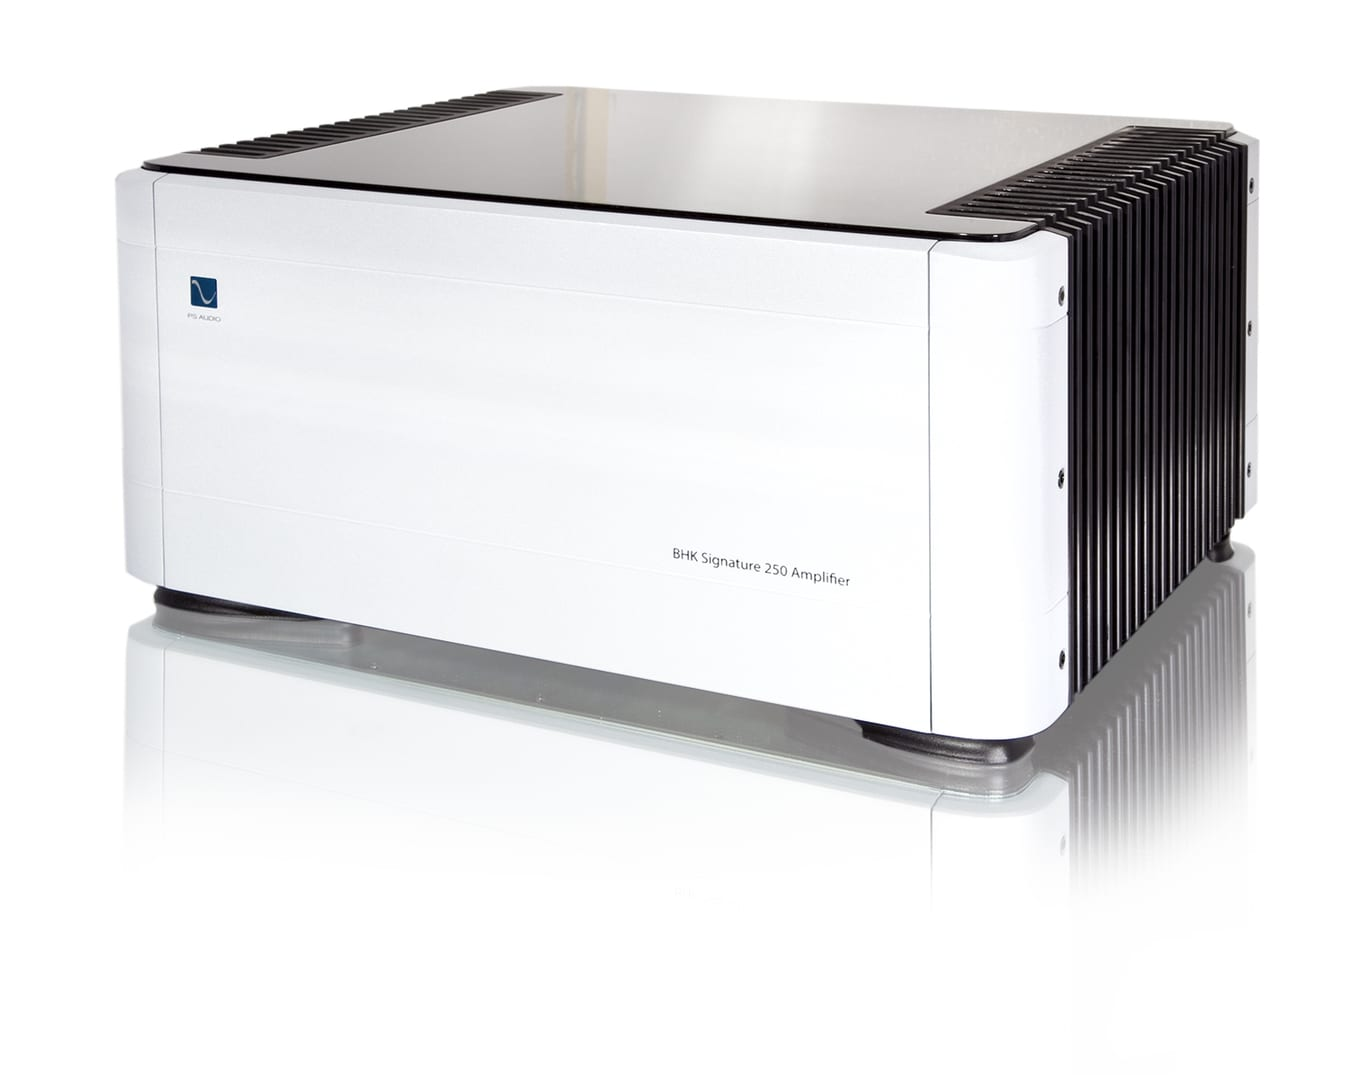 PS Audio BHK Signature 300 Mono Power Amplifier